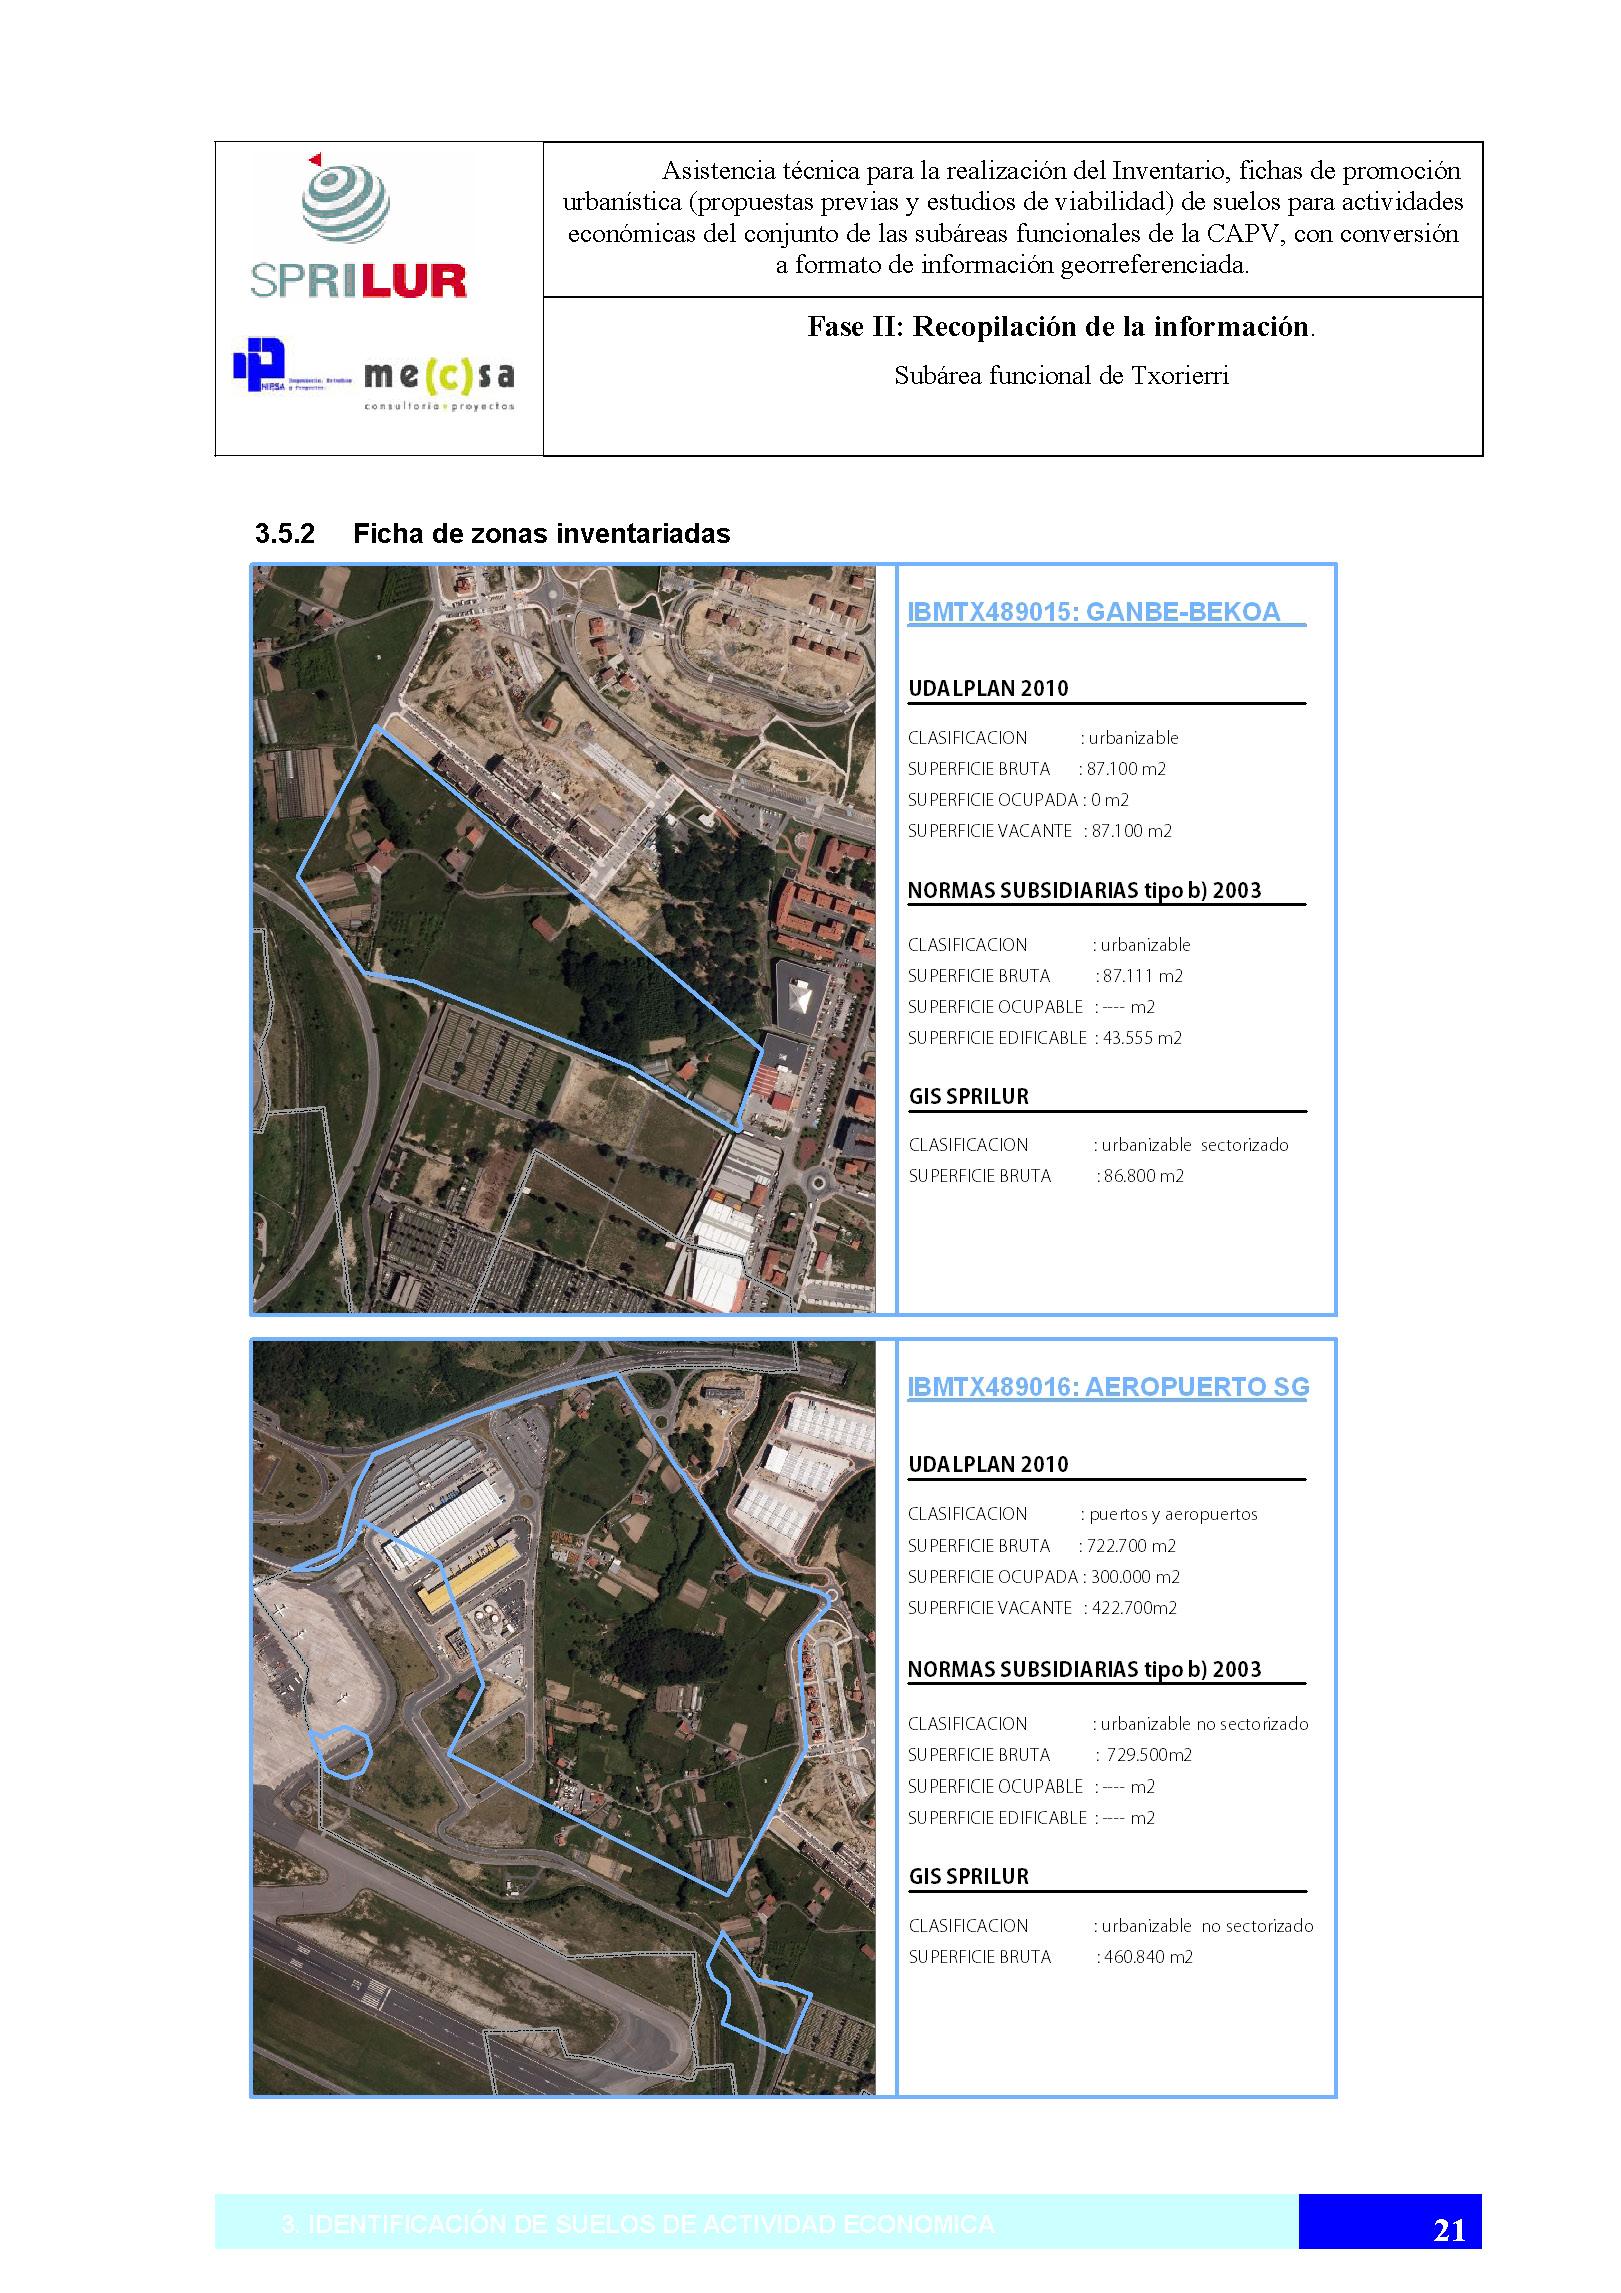 Ficha inventario GIS